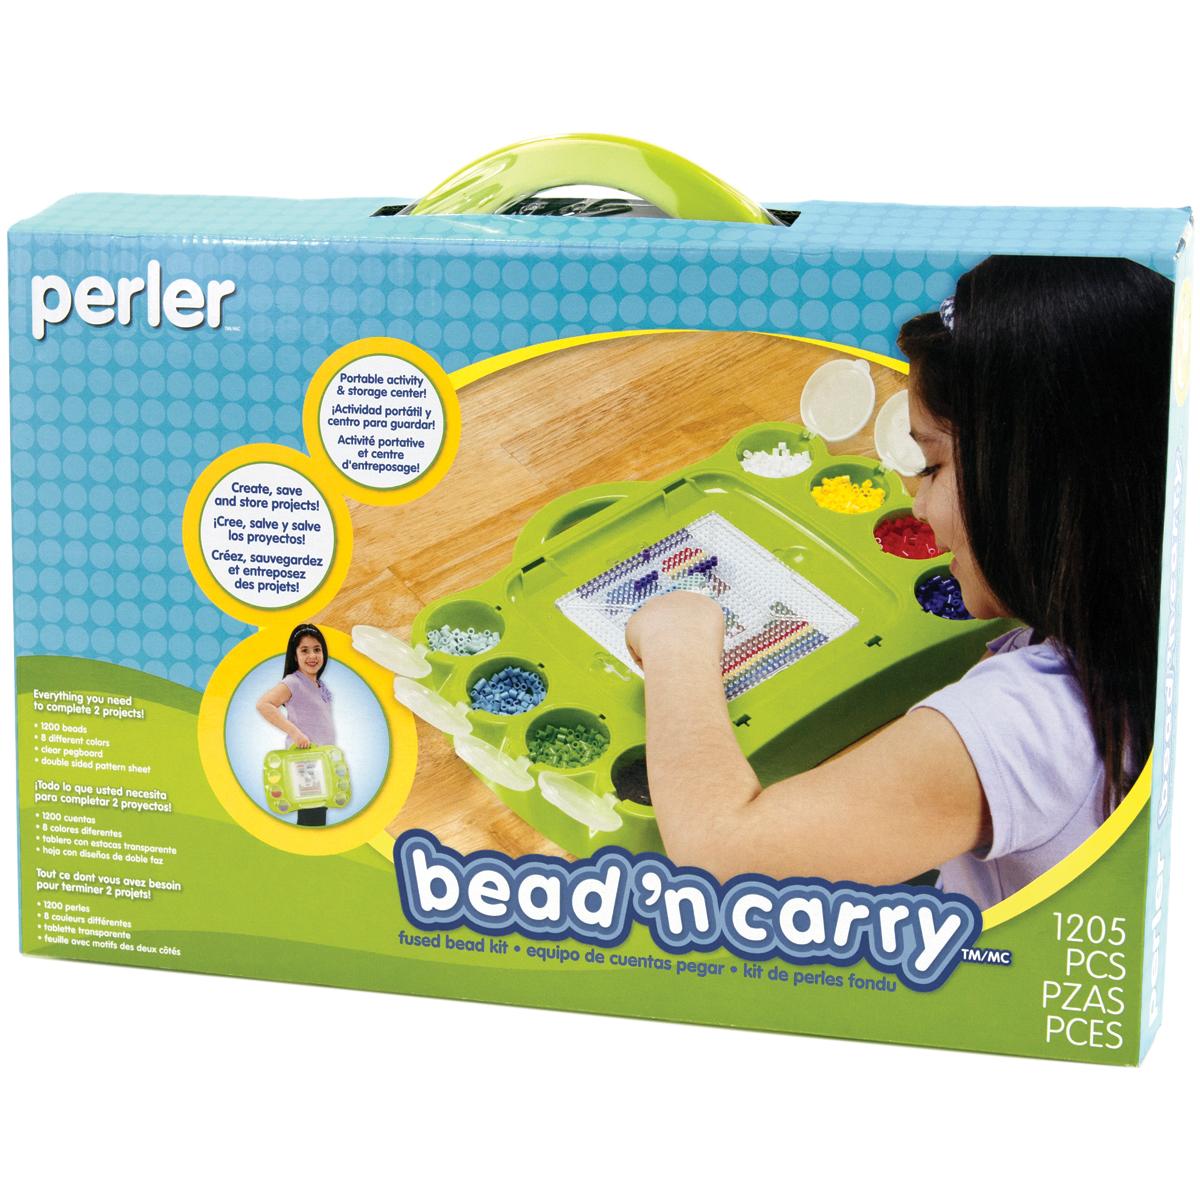 Perler Bead 'n Carry Fused Bead Kit-